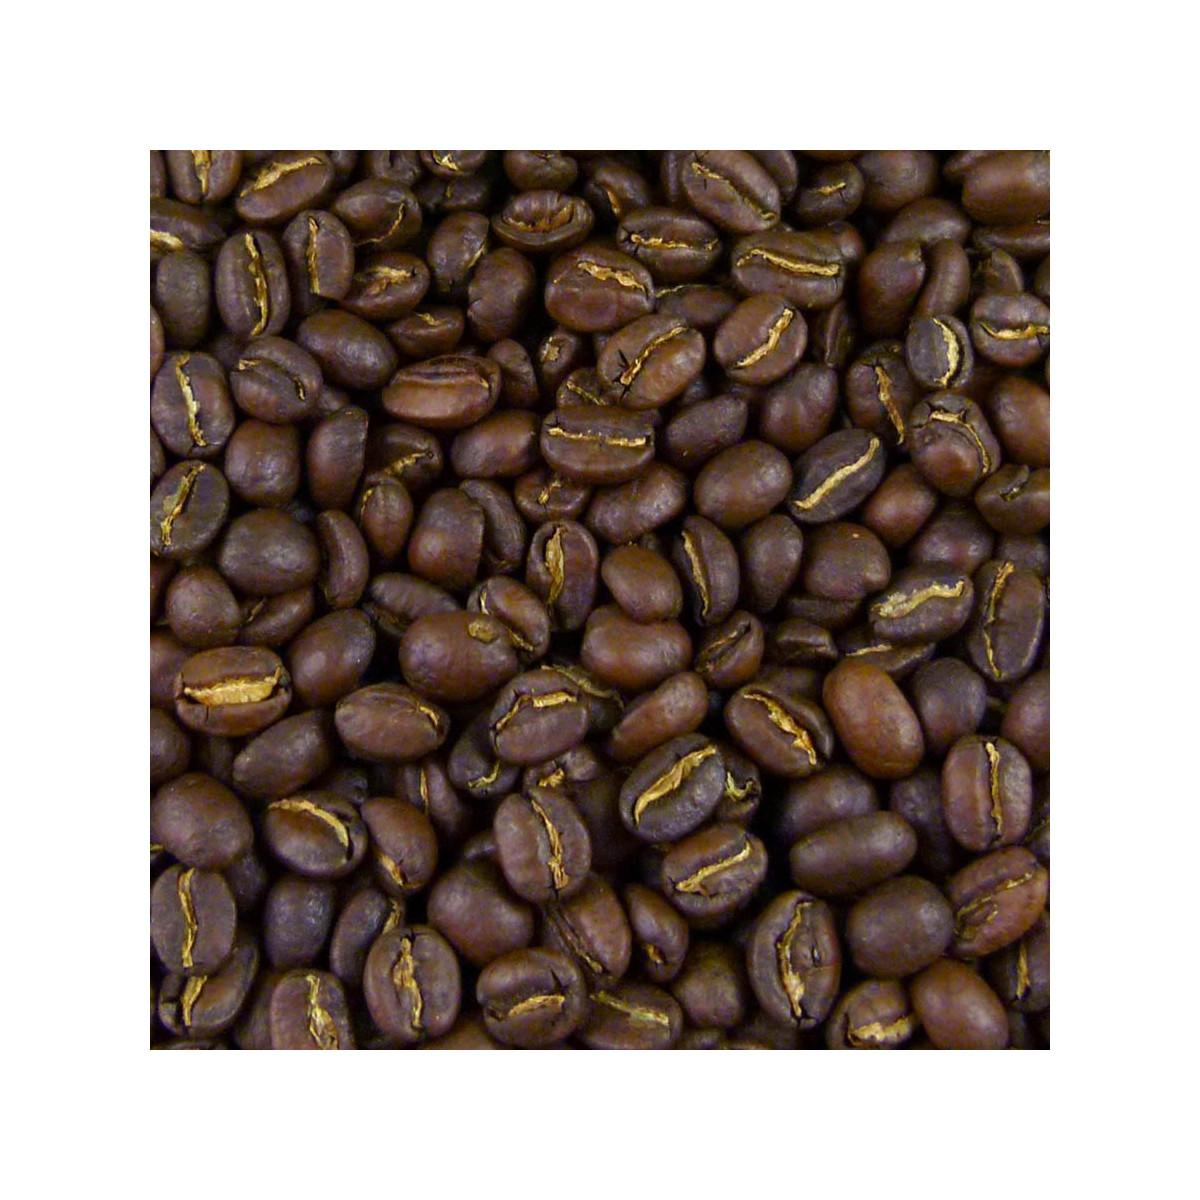 Café Ethiopie Moka lavé de Yrgacheffe Région de Sidamo (sachet de 100 grammes)